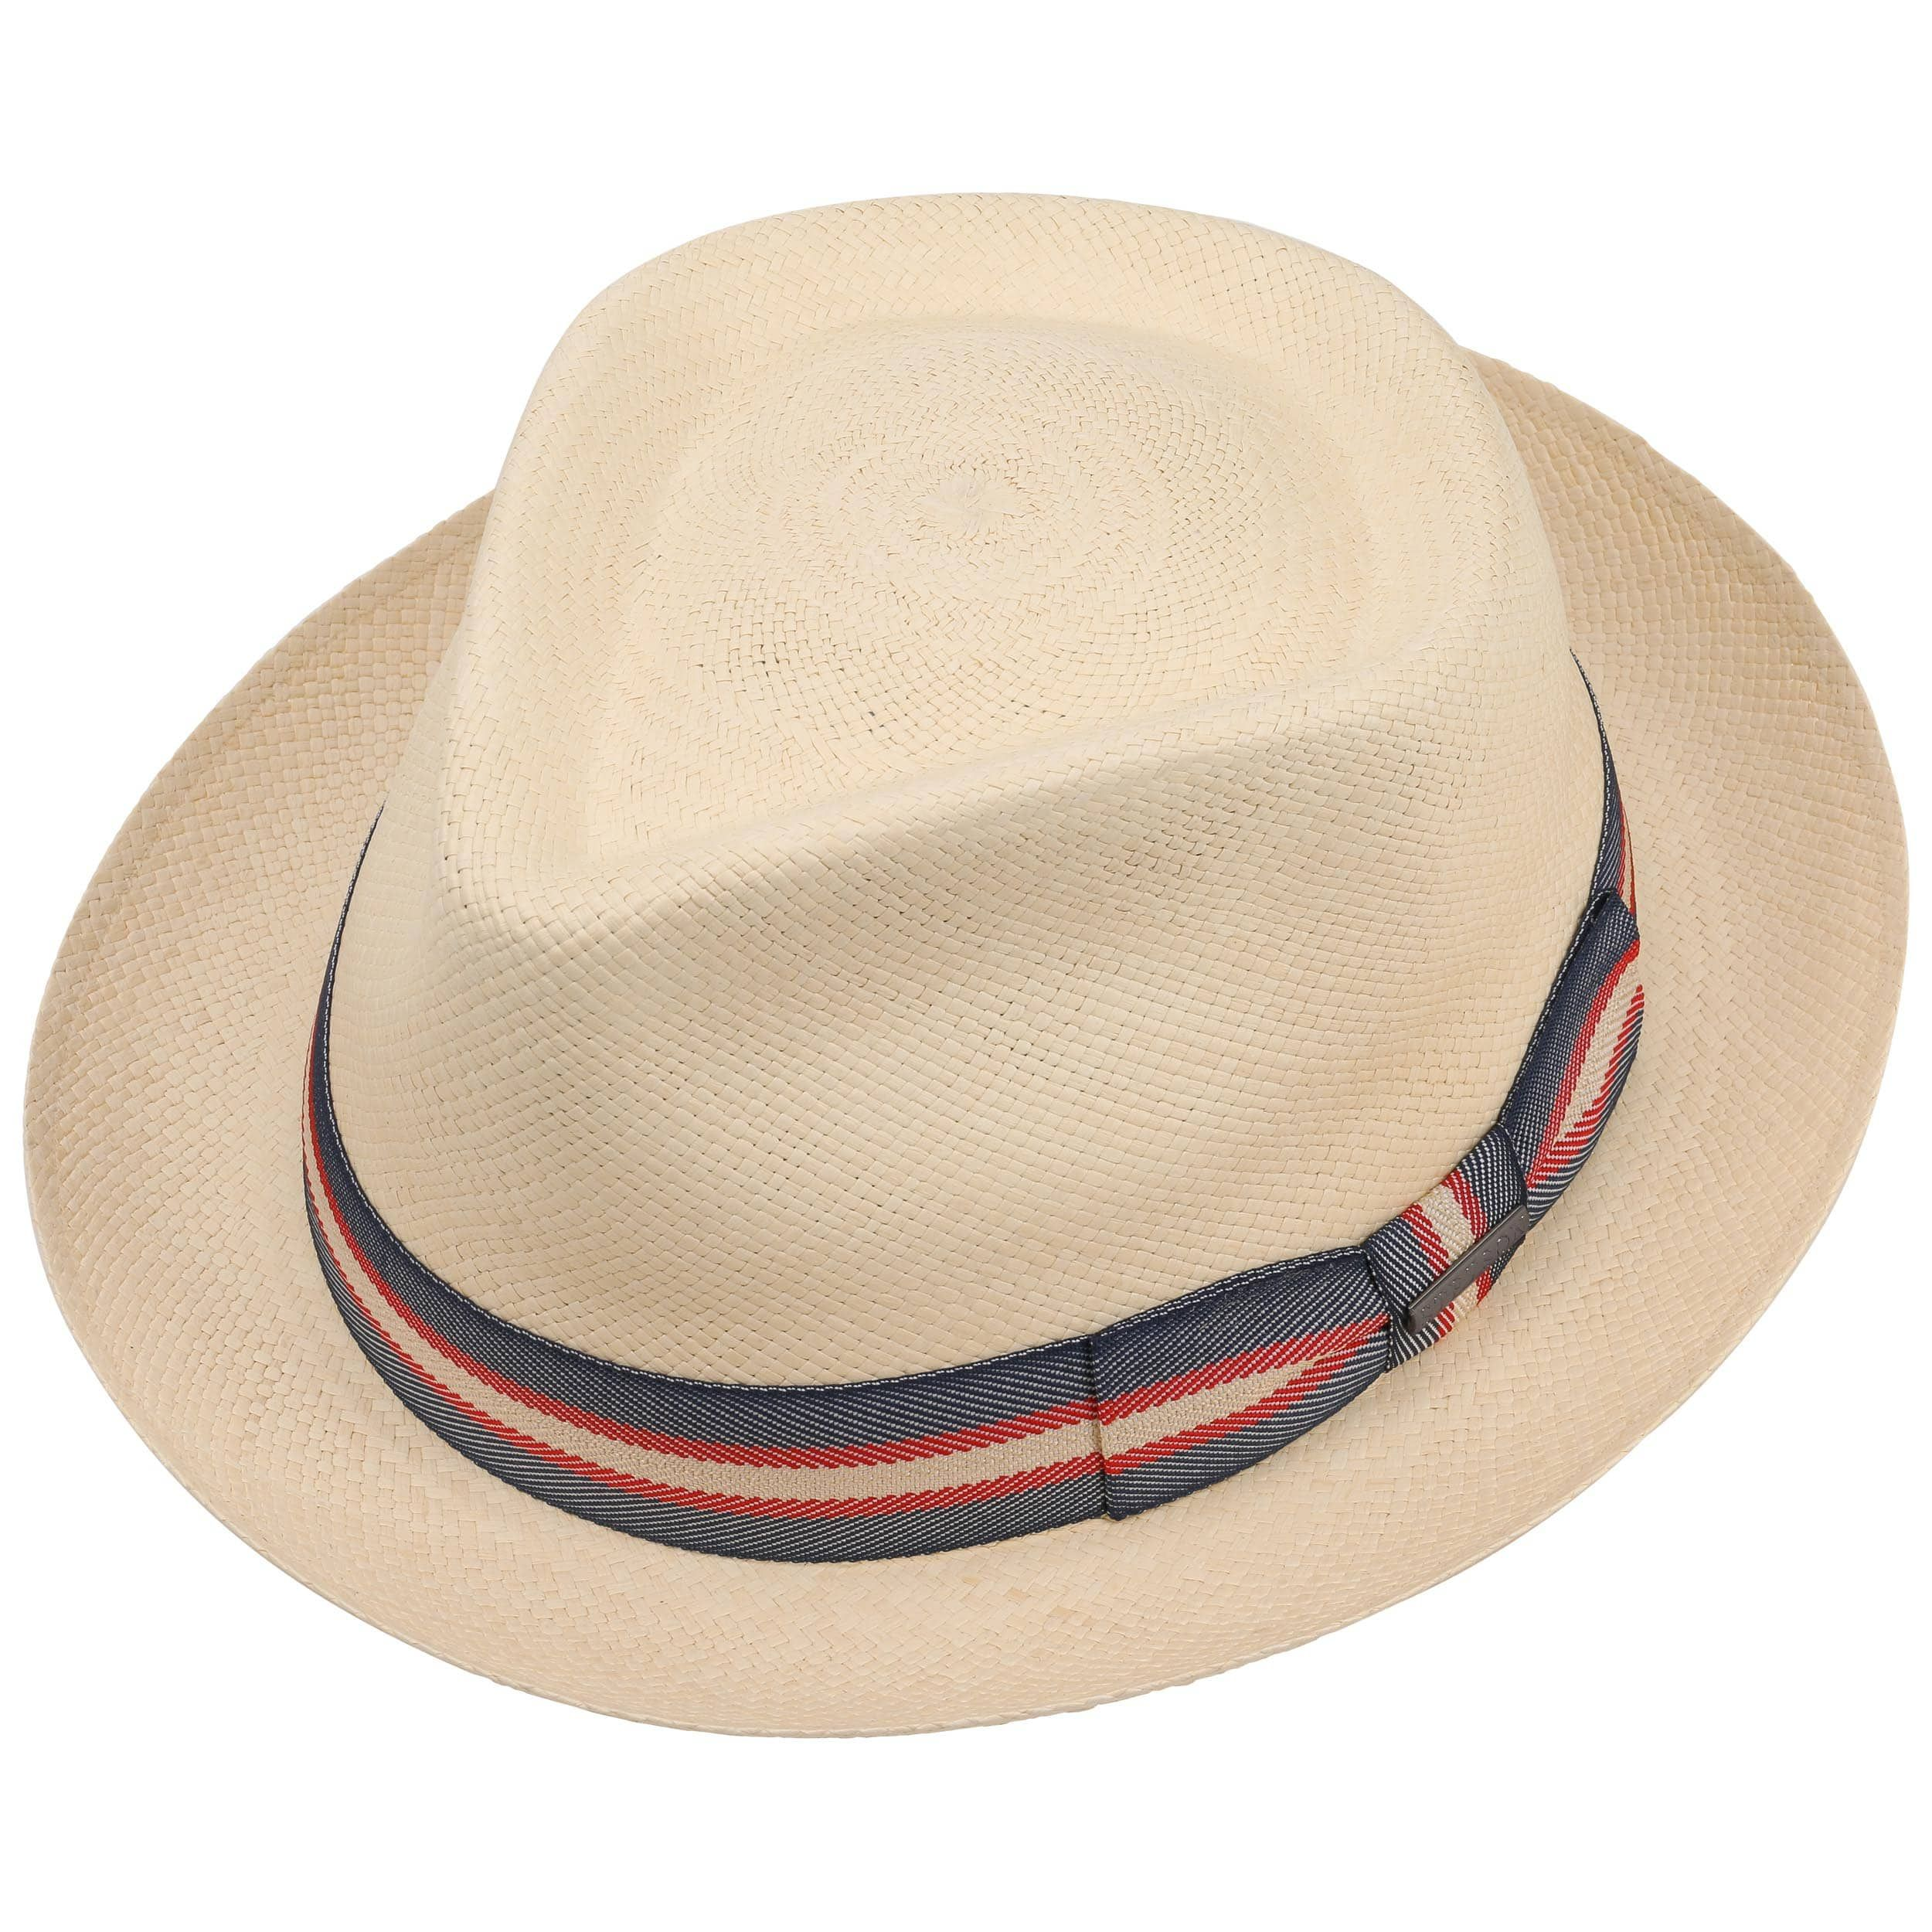 Ocate Panama Player Strohhut cremeweiß